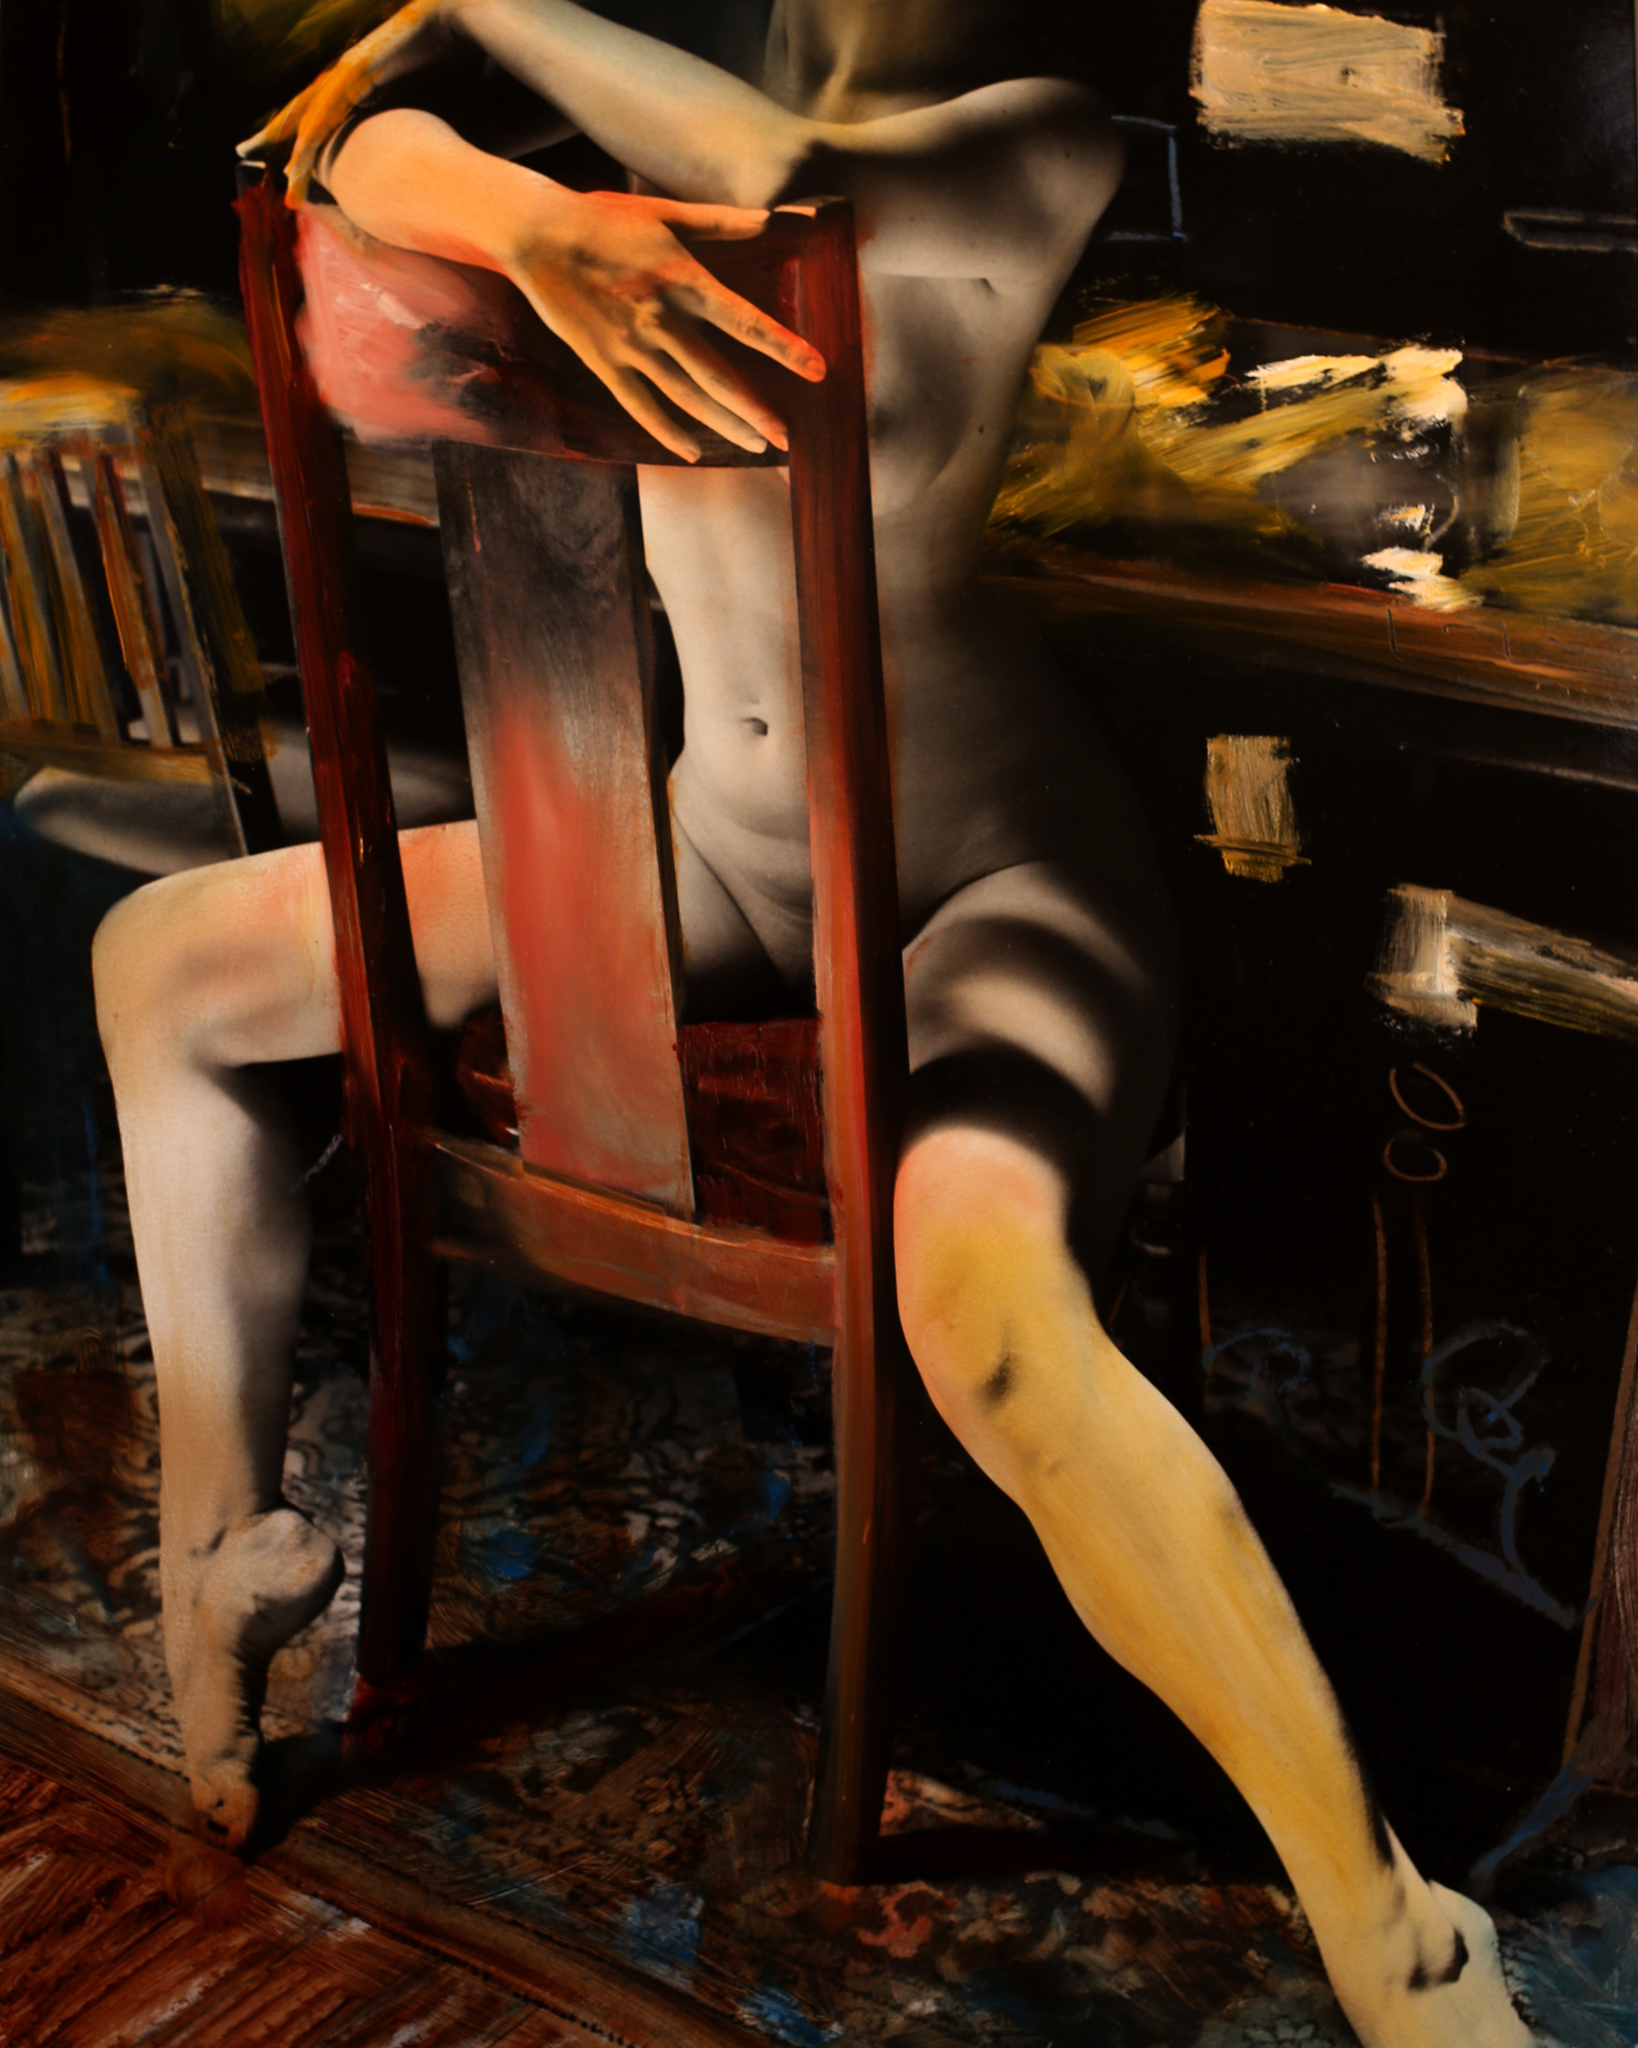 Kim-Weston-Painted-16x20-7.jpg